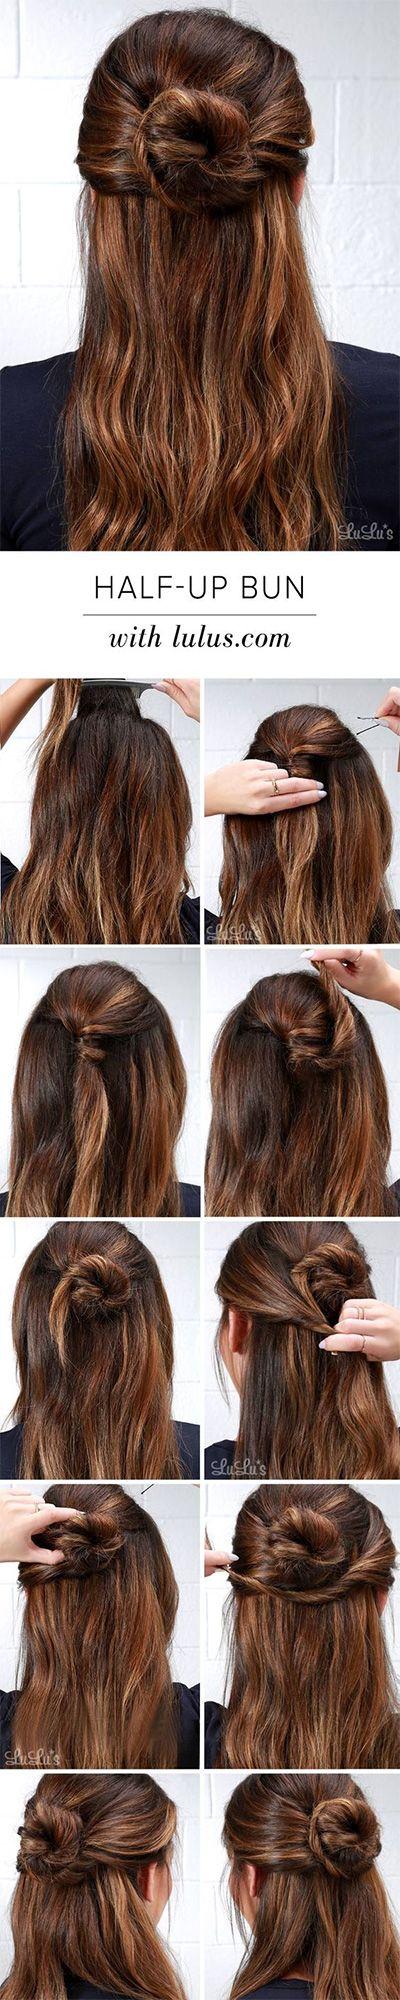 how to properly create the half-up-half-down bun (the hun)